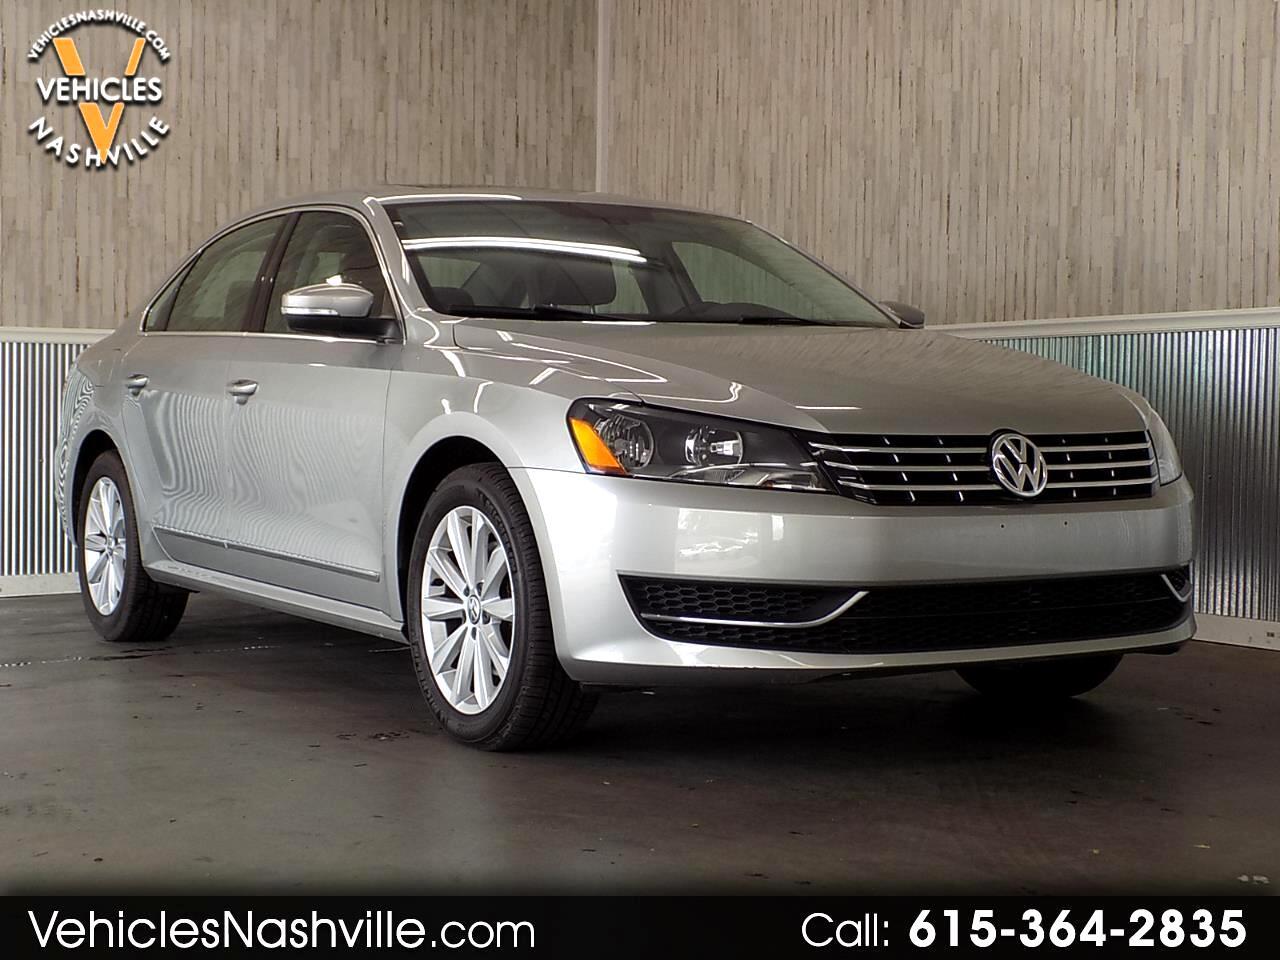 Volkswagen Passat 2.5L SEL Premium 2013